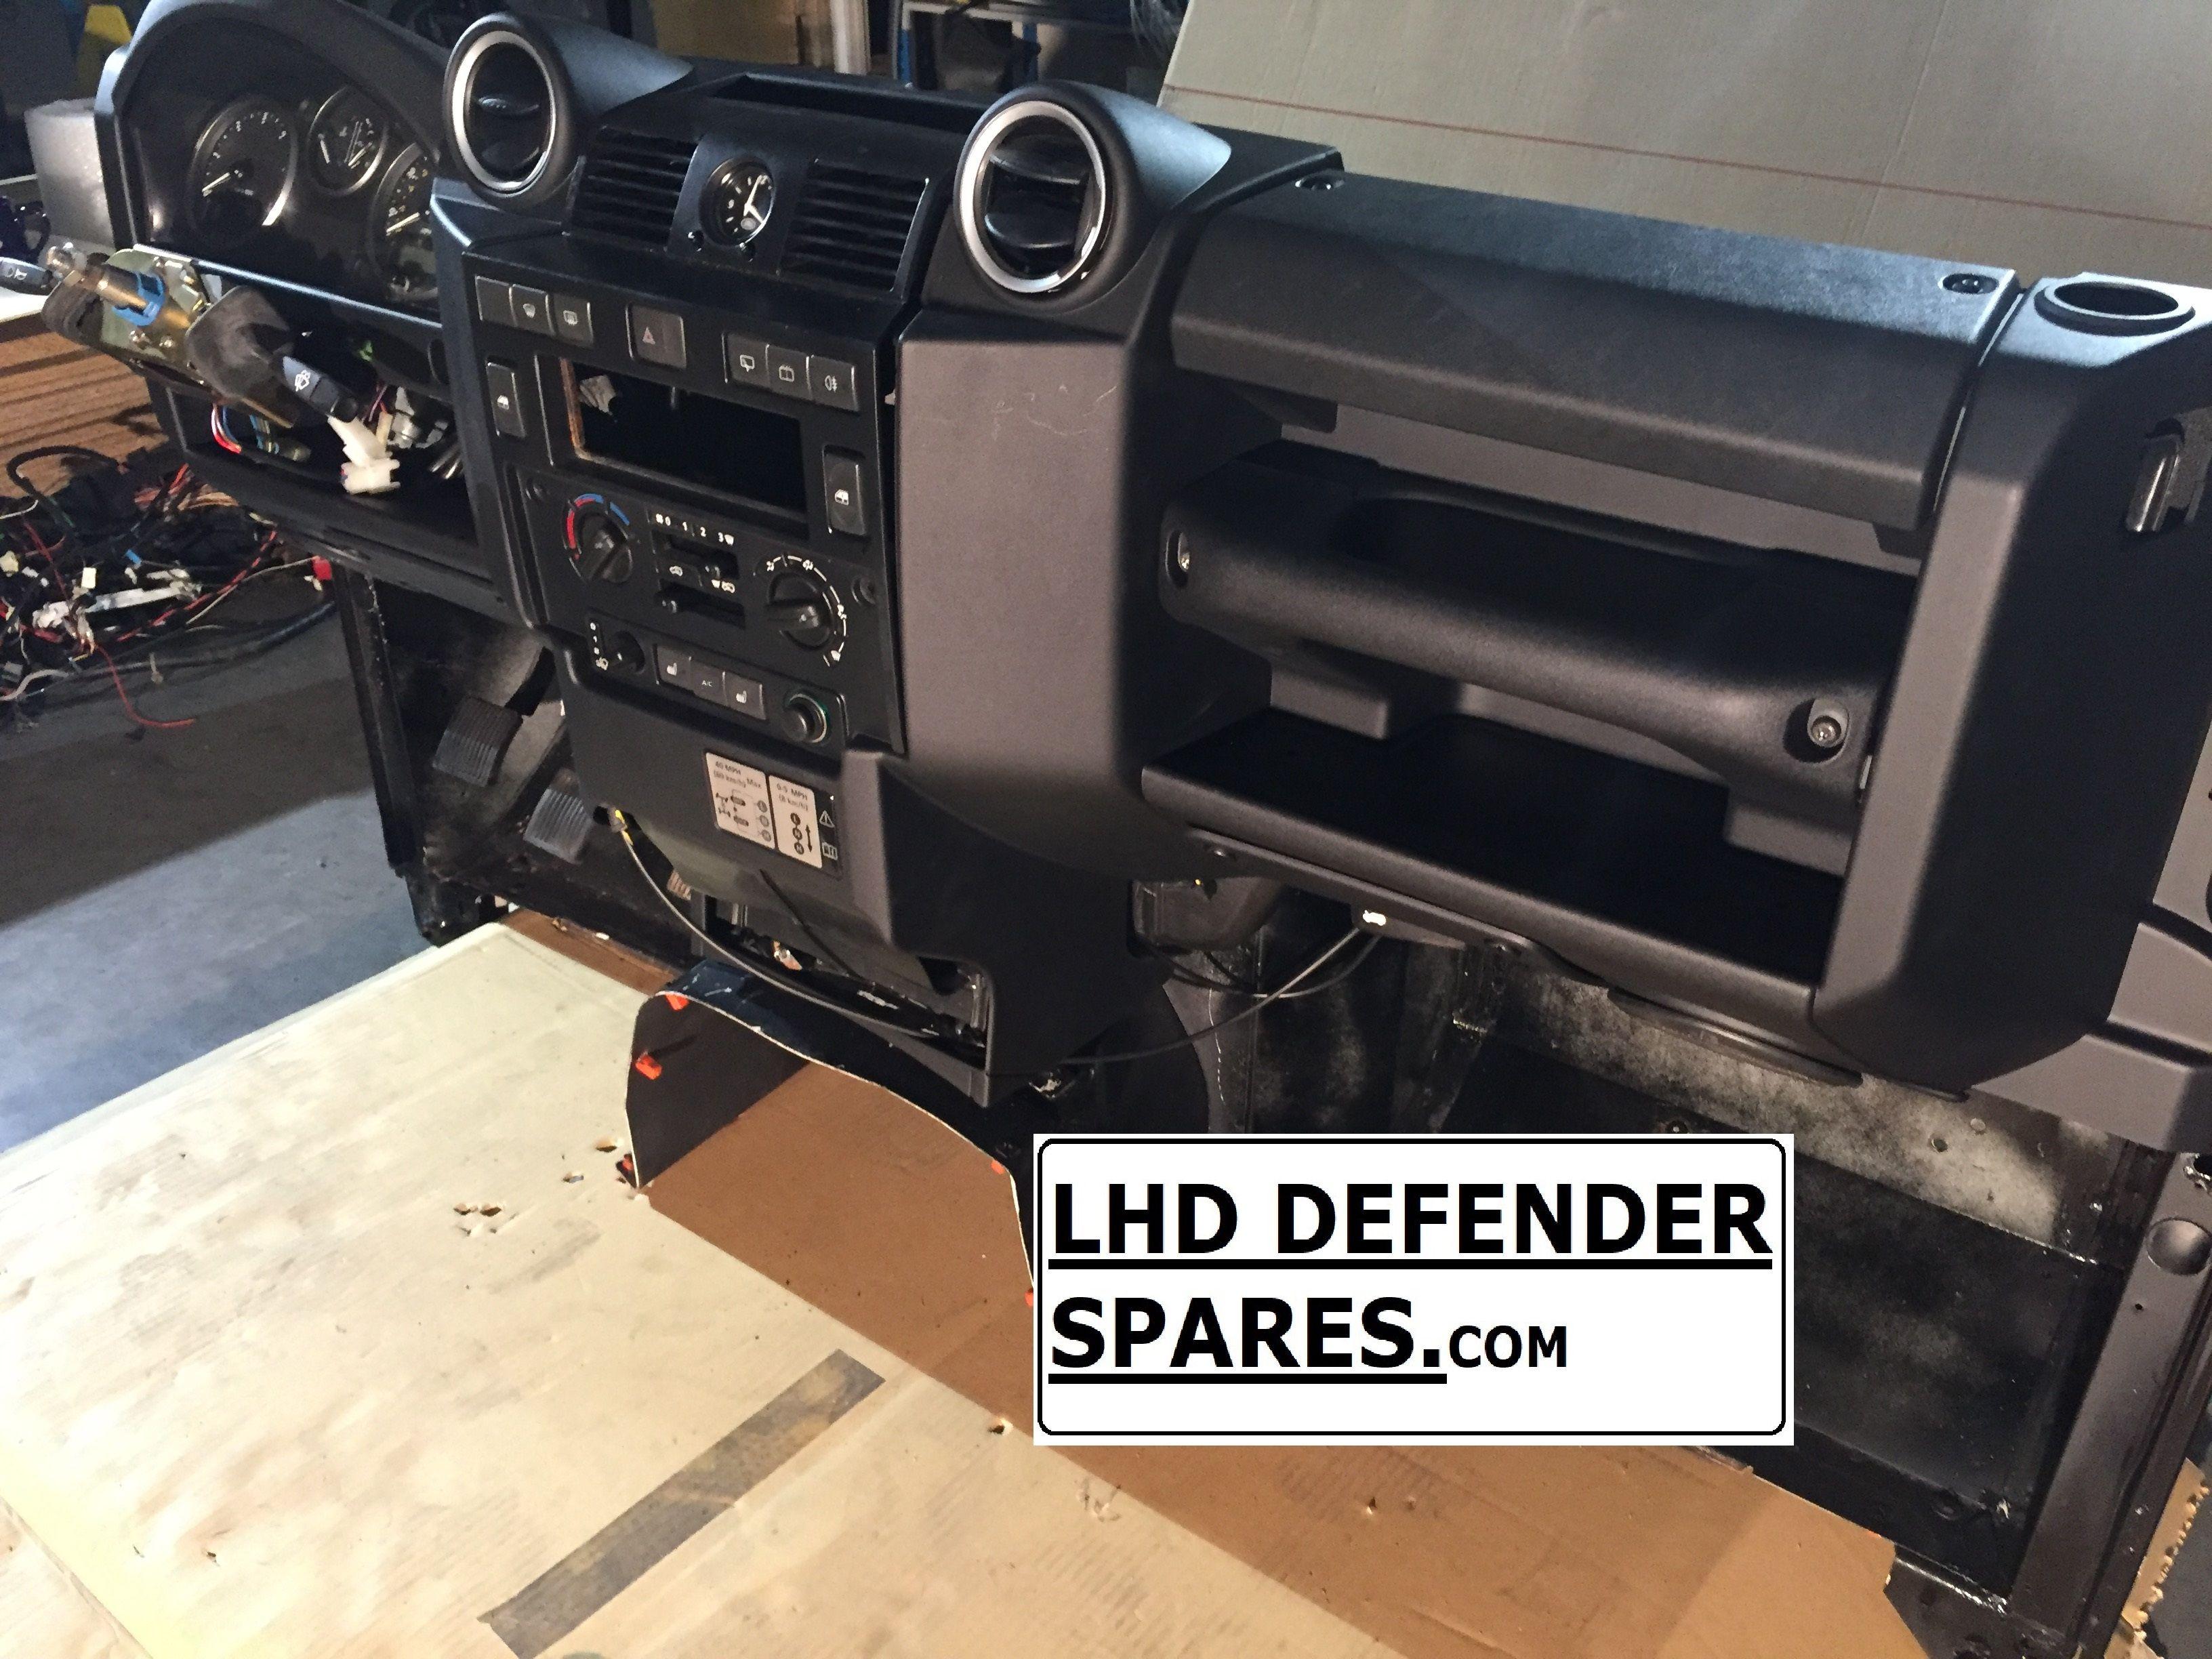 Lhd Defender Bulkhead Left Hand Drive Defender Bulkhead Puma For Sale Lhddefenderspares Defender Land Rover Defender Land Rover